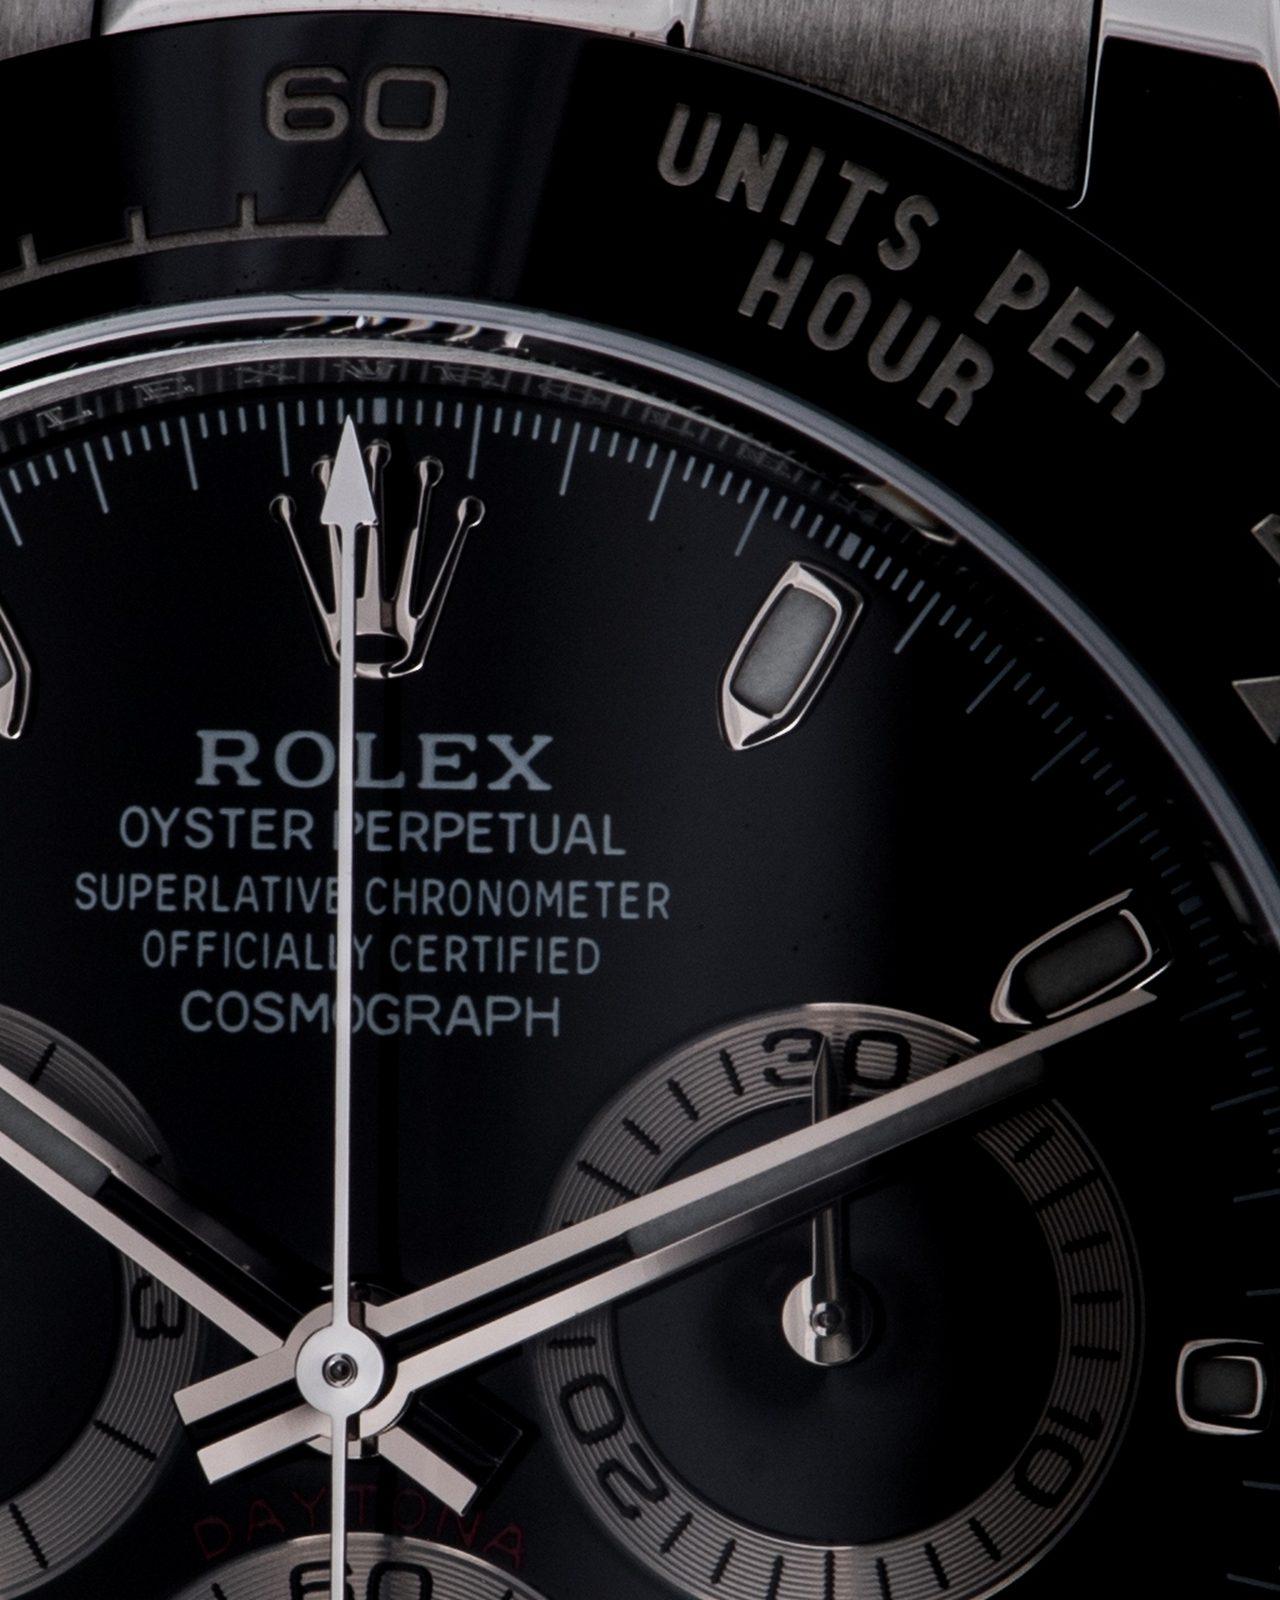 watch-test-rolex-daytona-116500ln-acciaio-con-lunetta-in-cerachrom-nera-prezzo-price_0-10026